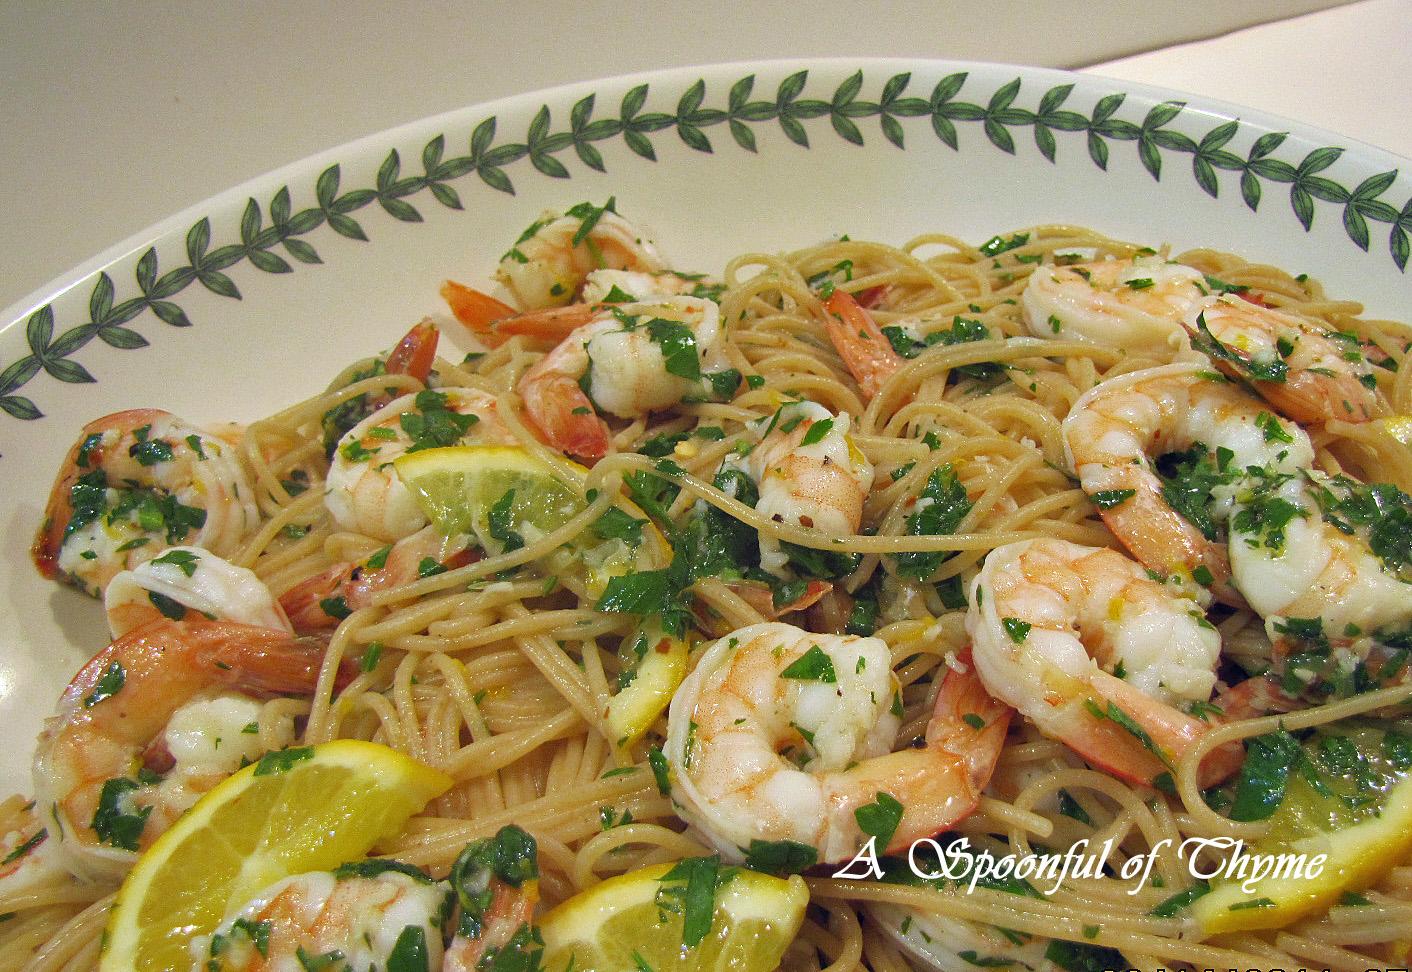 Ina Garten Shrimp Linguine Linguine With Shrimp Recipe Dishmaps